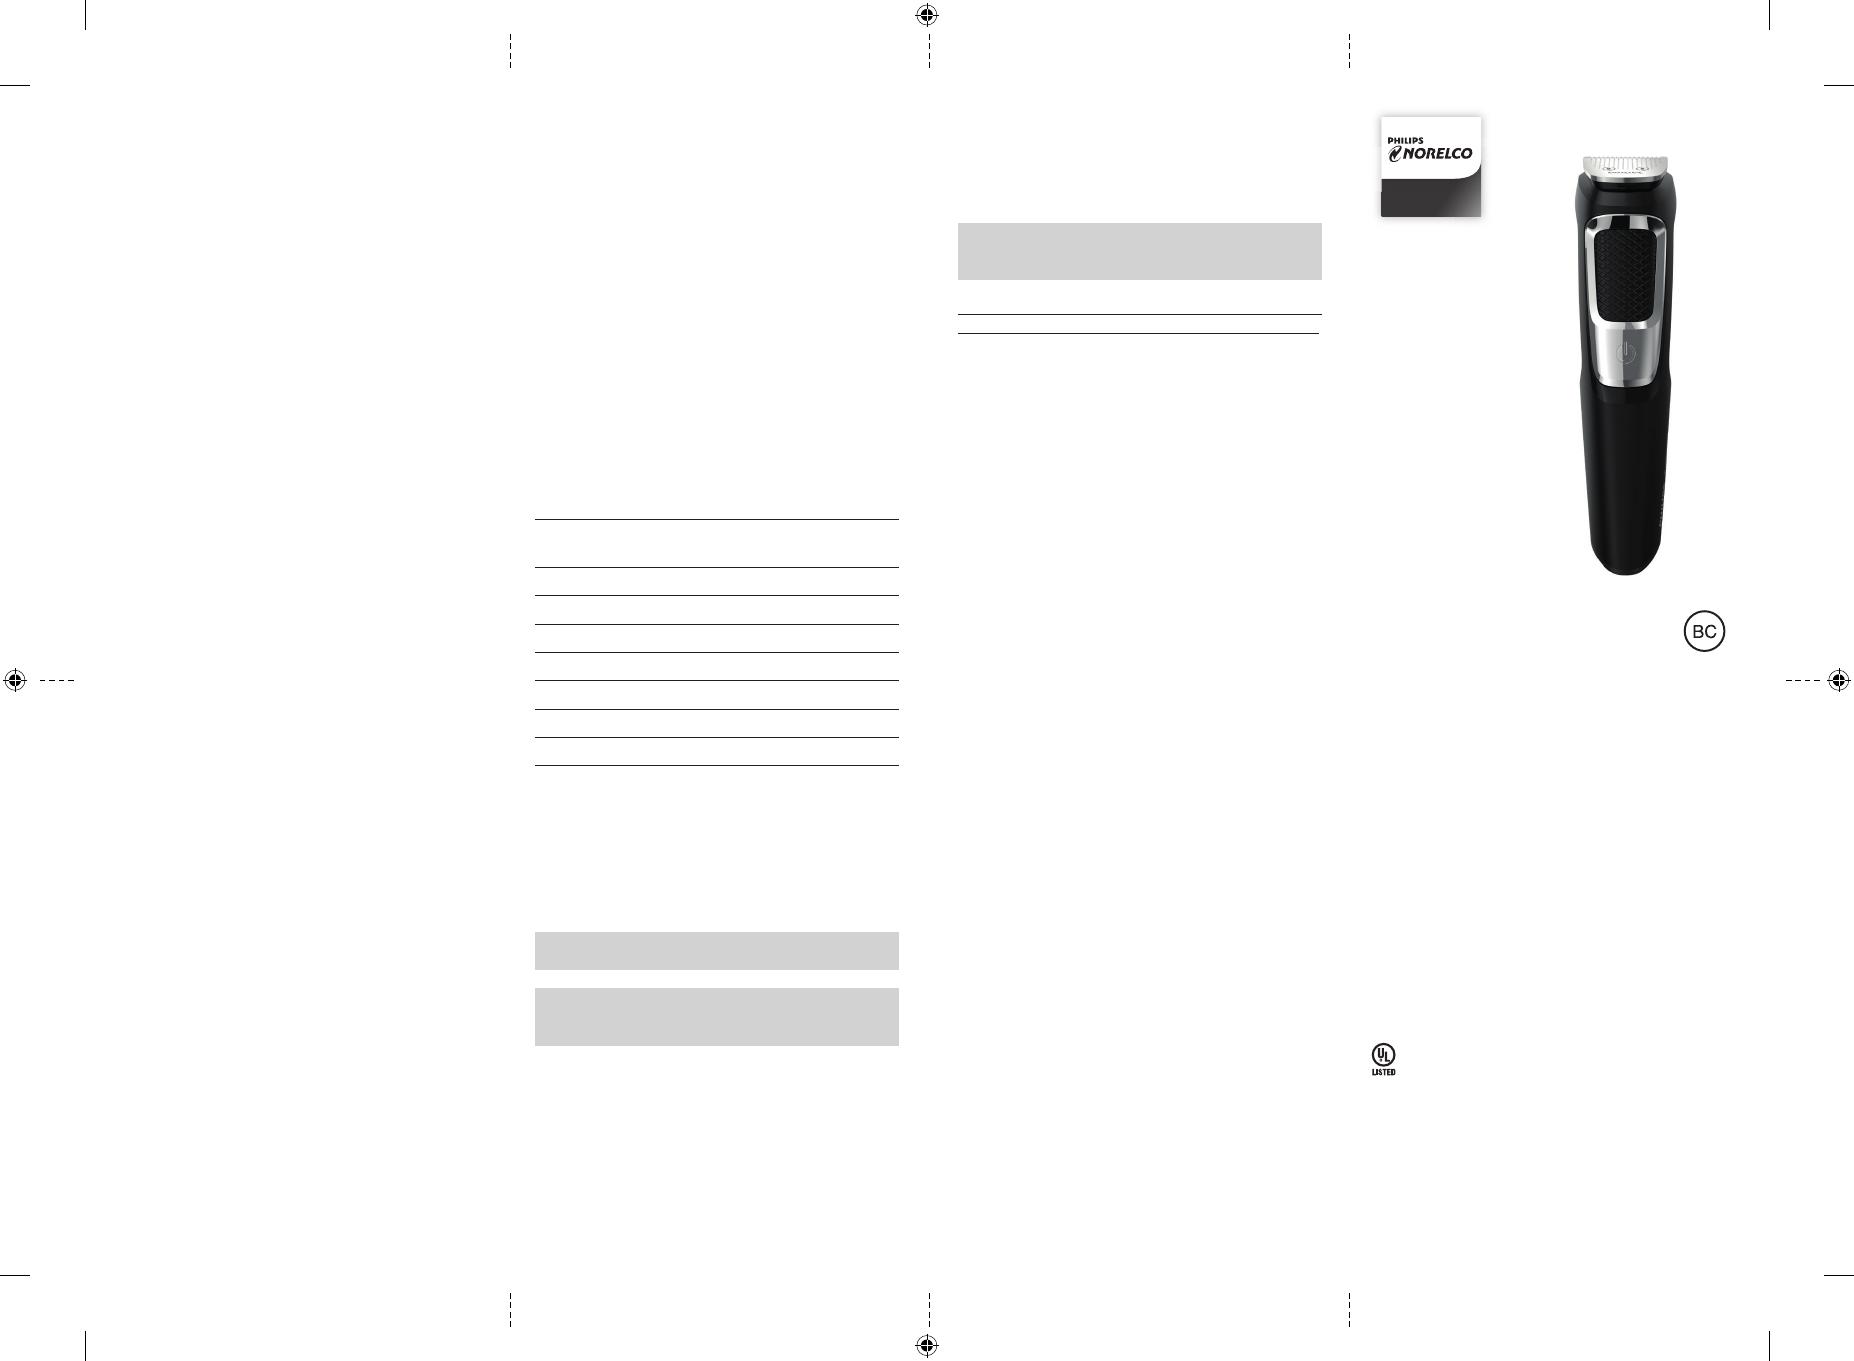 Инструкция Philips Norelco BT5215 (2 страницы)